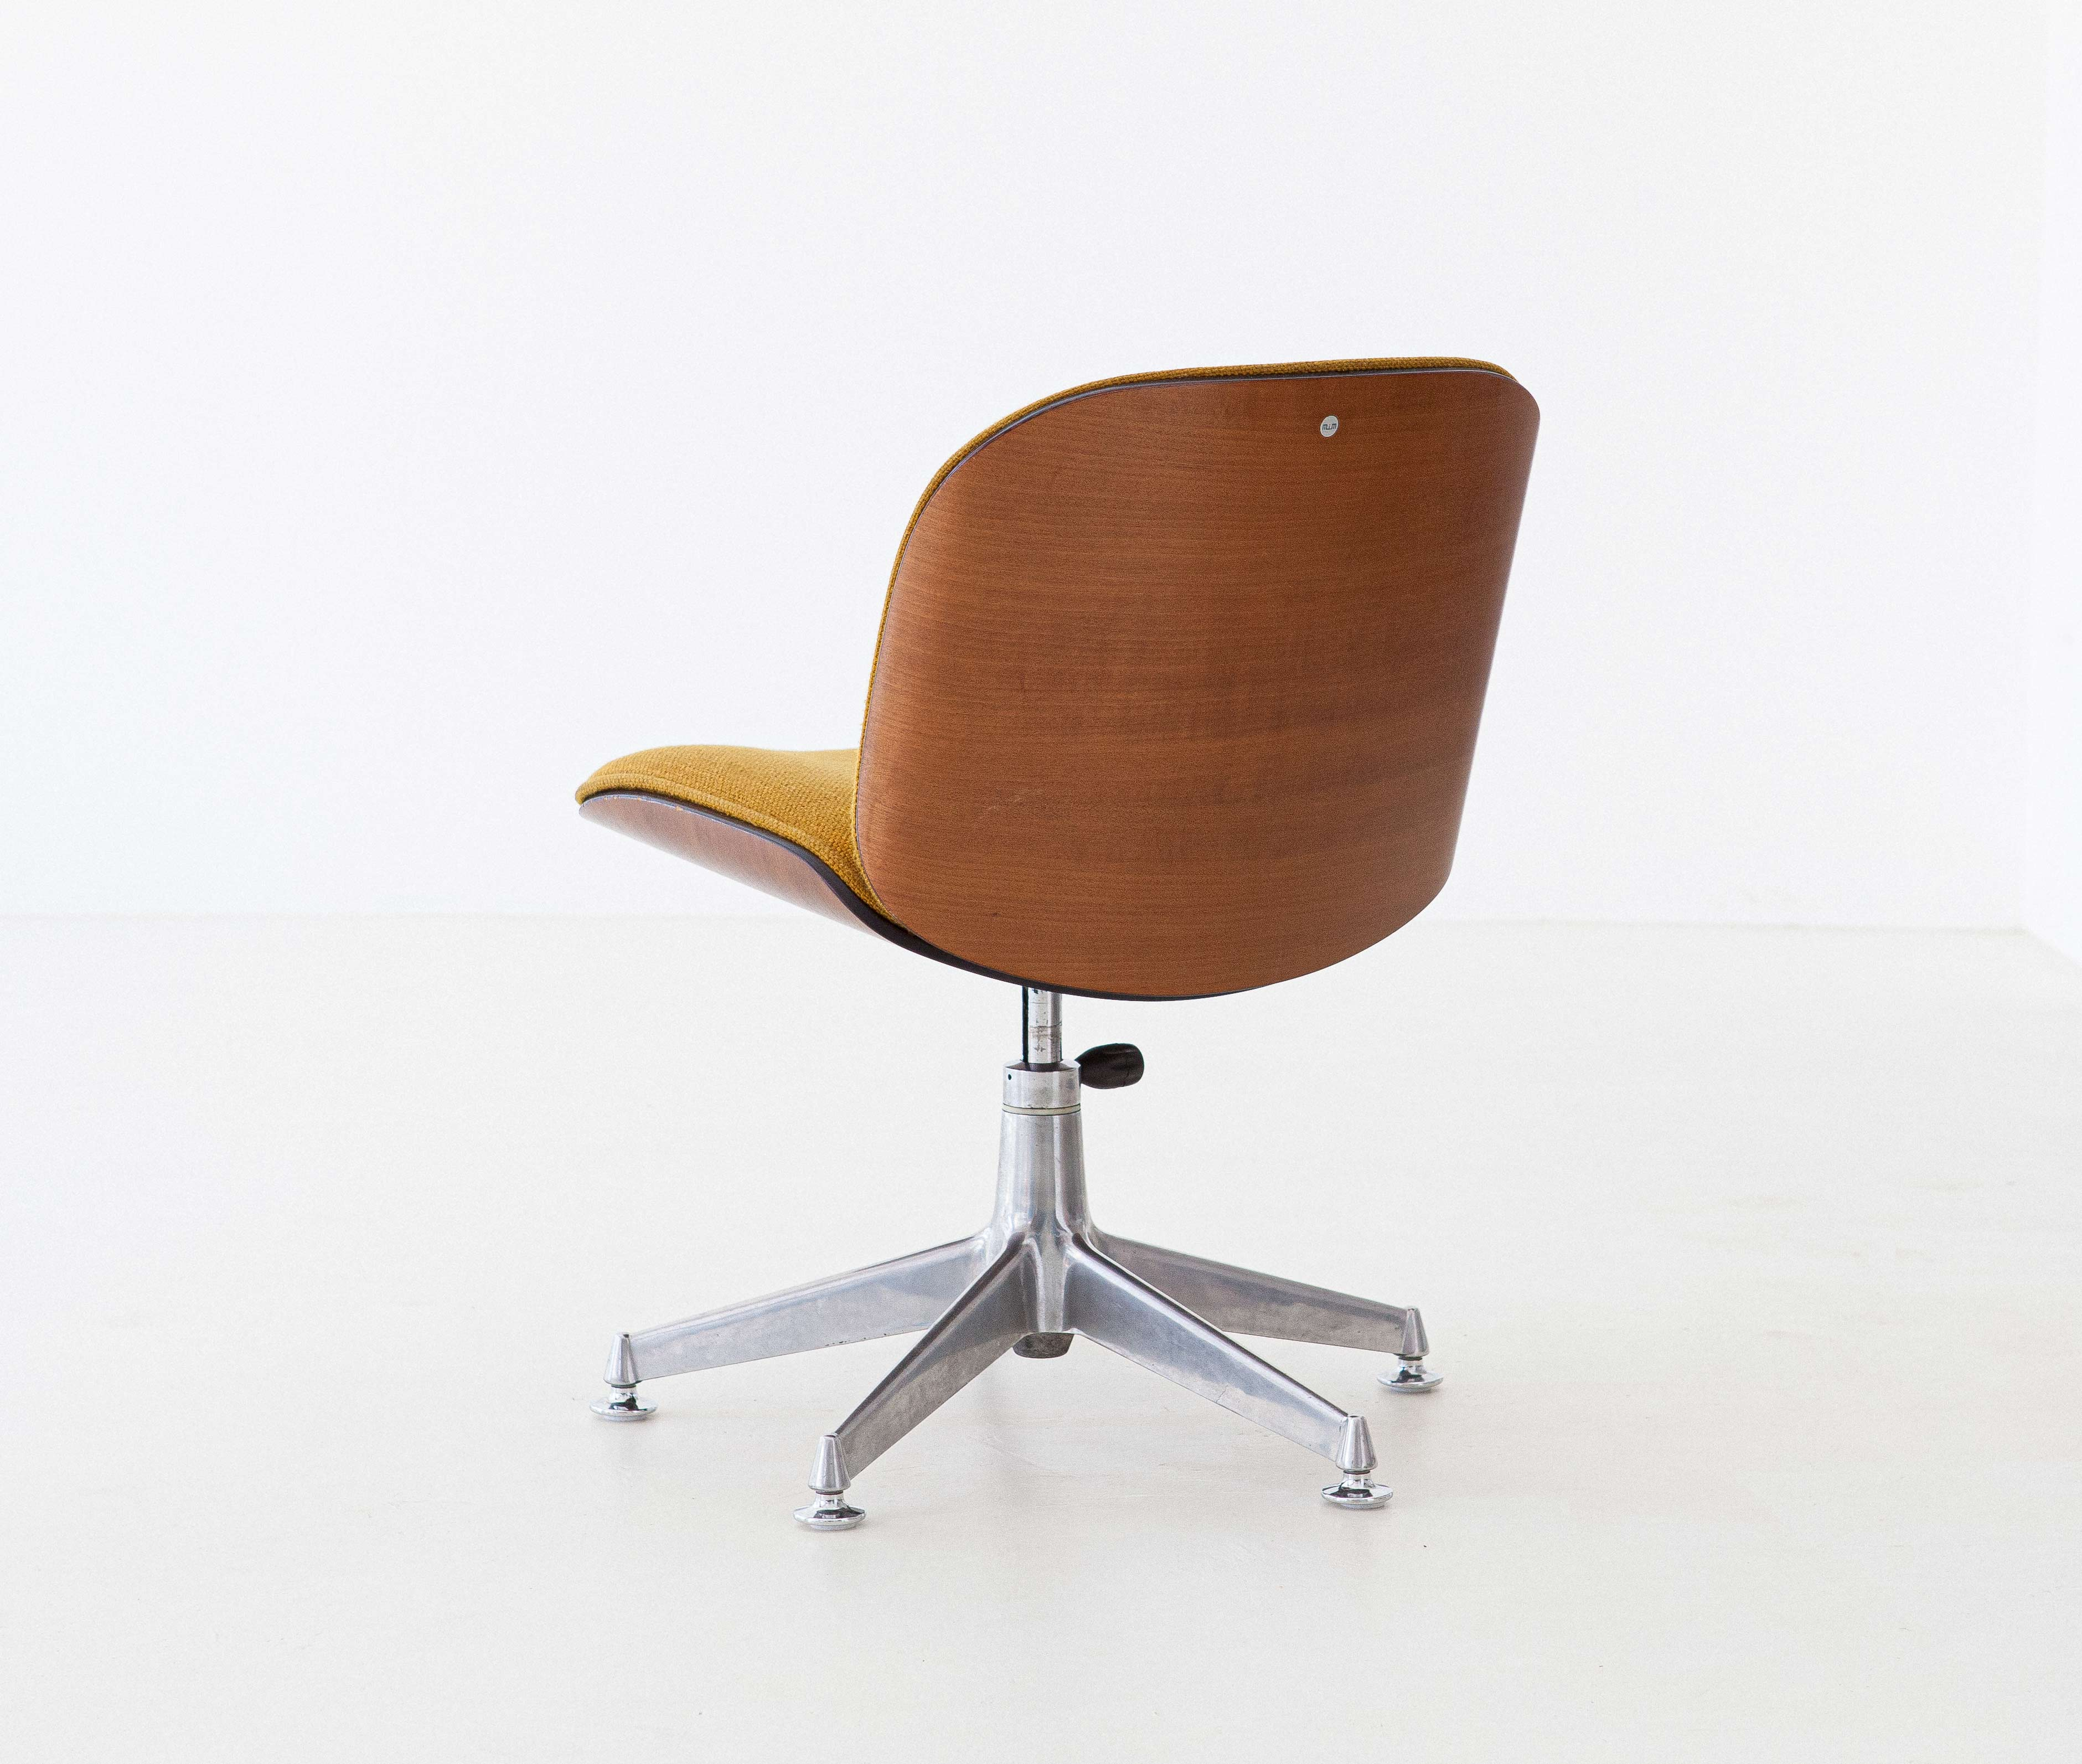 1950s-ico-parisi-for-mim-walnut-swivel-desk-chairs-7-se305